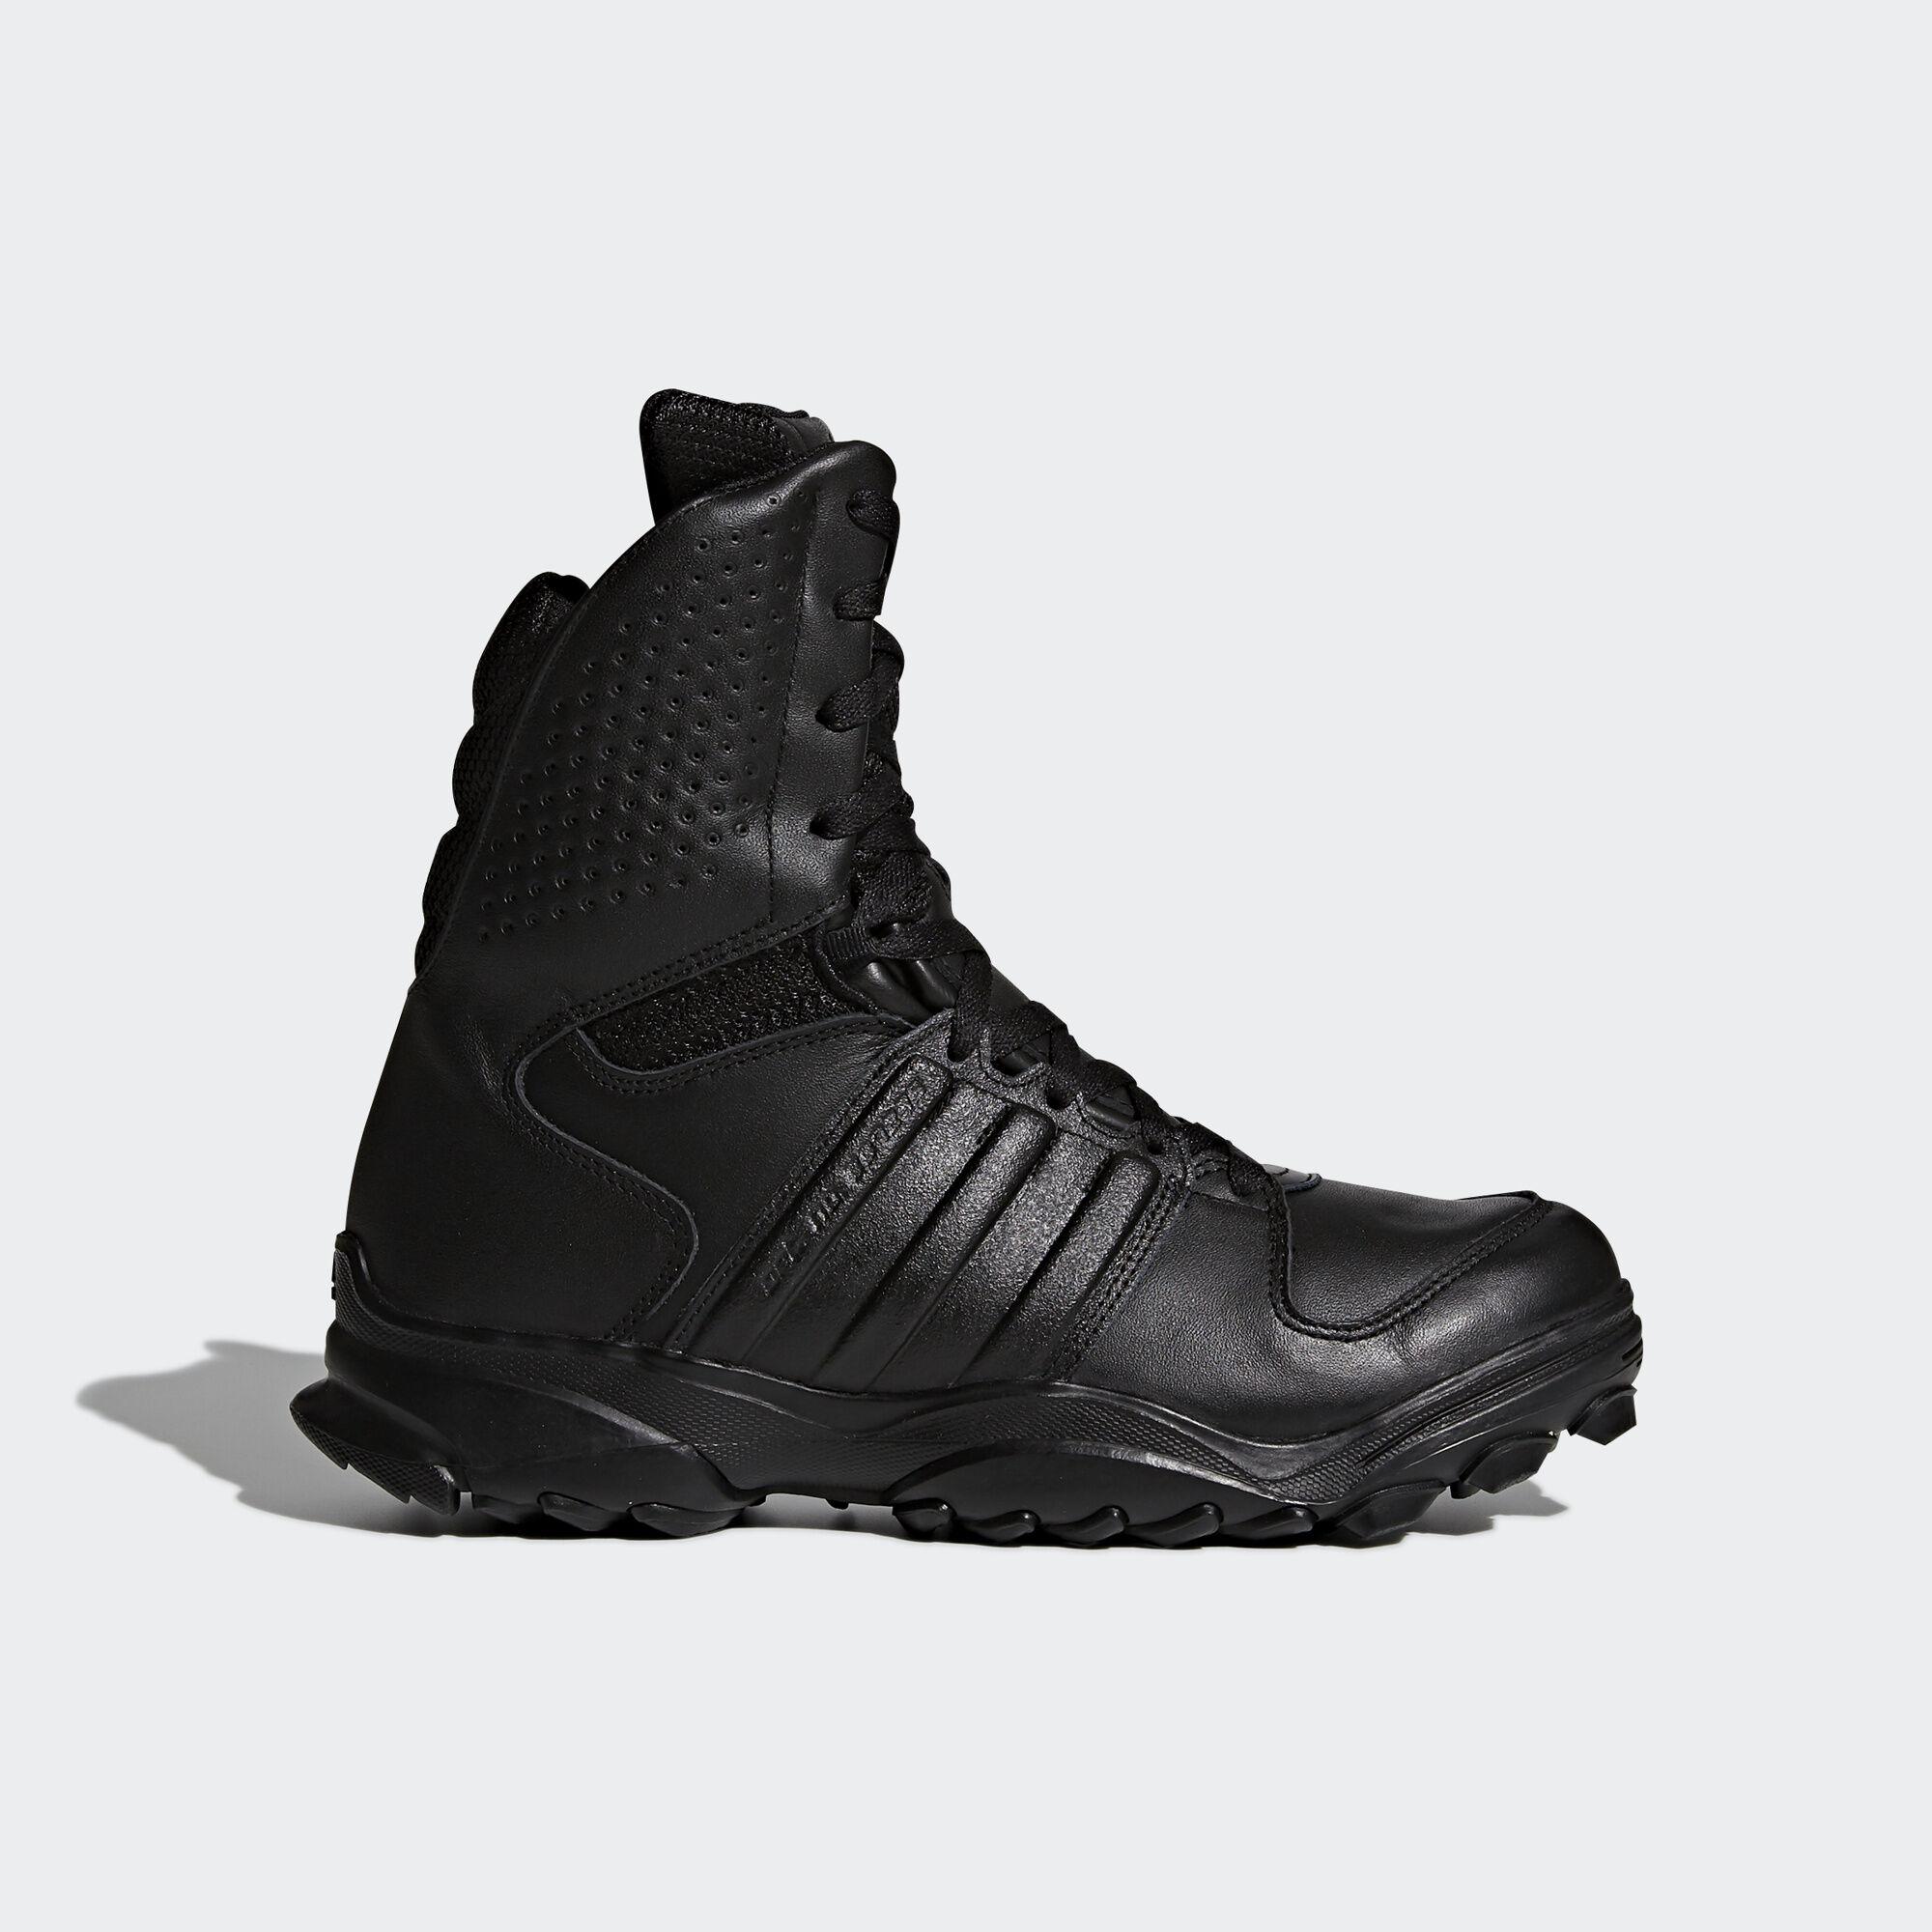 Adidas Gsg 9 2 Boots Black Adidas Us